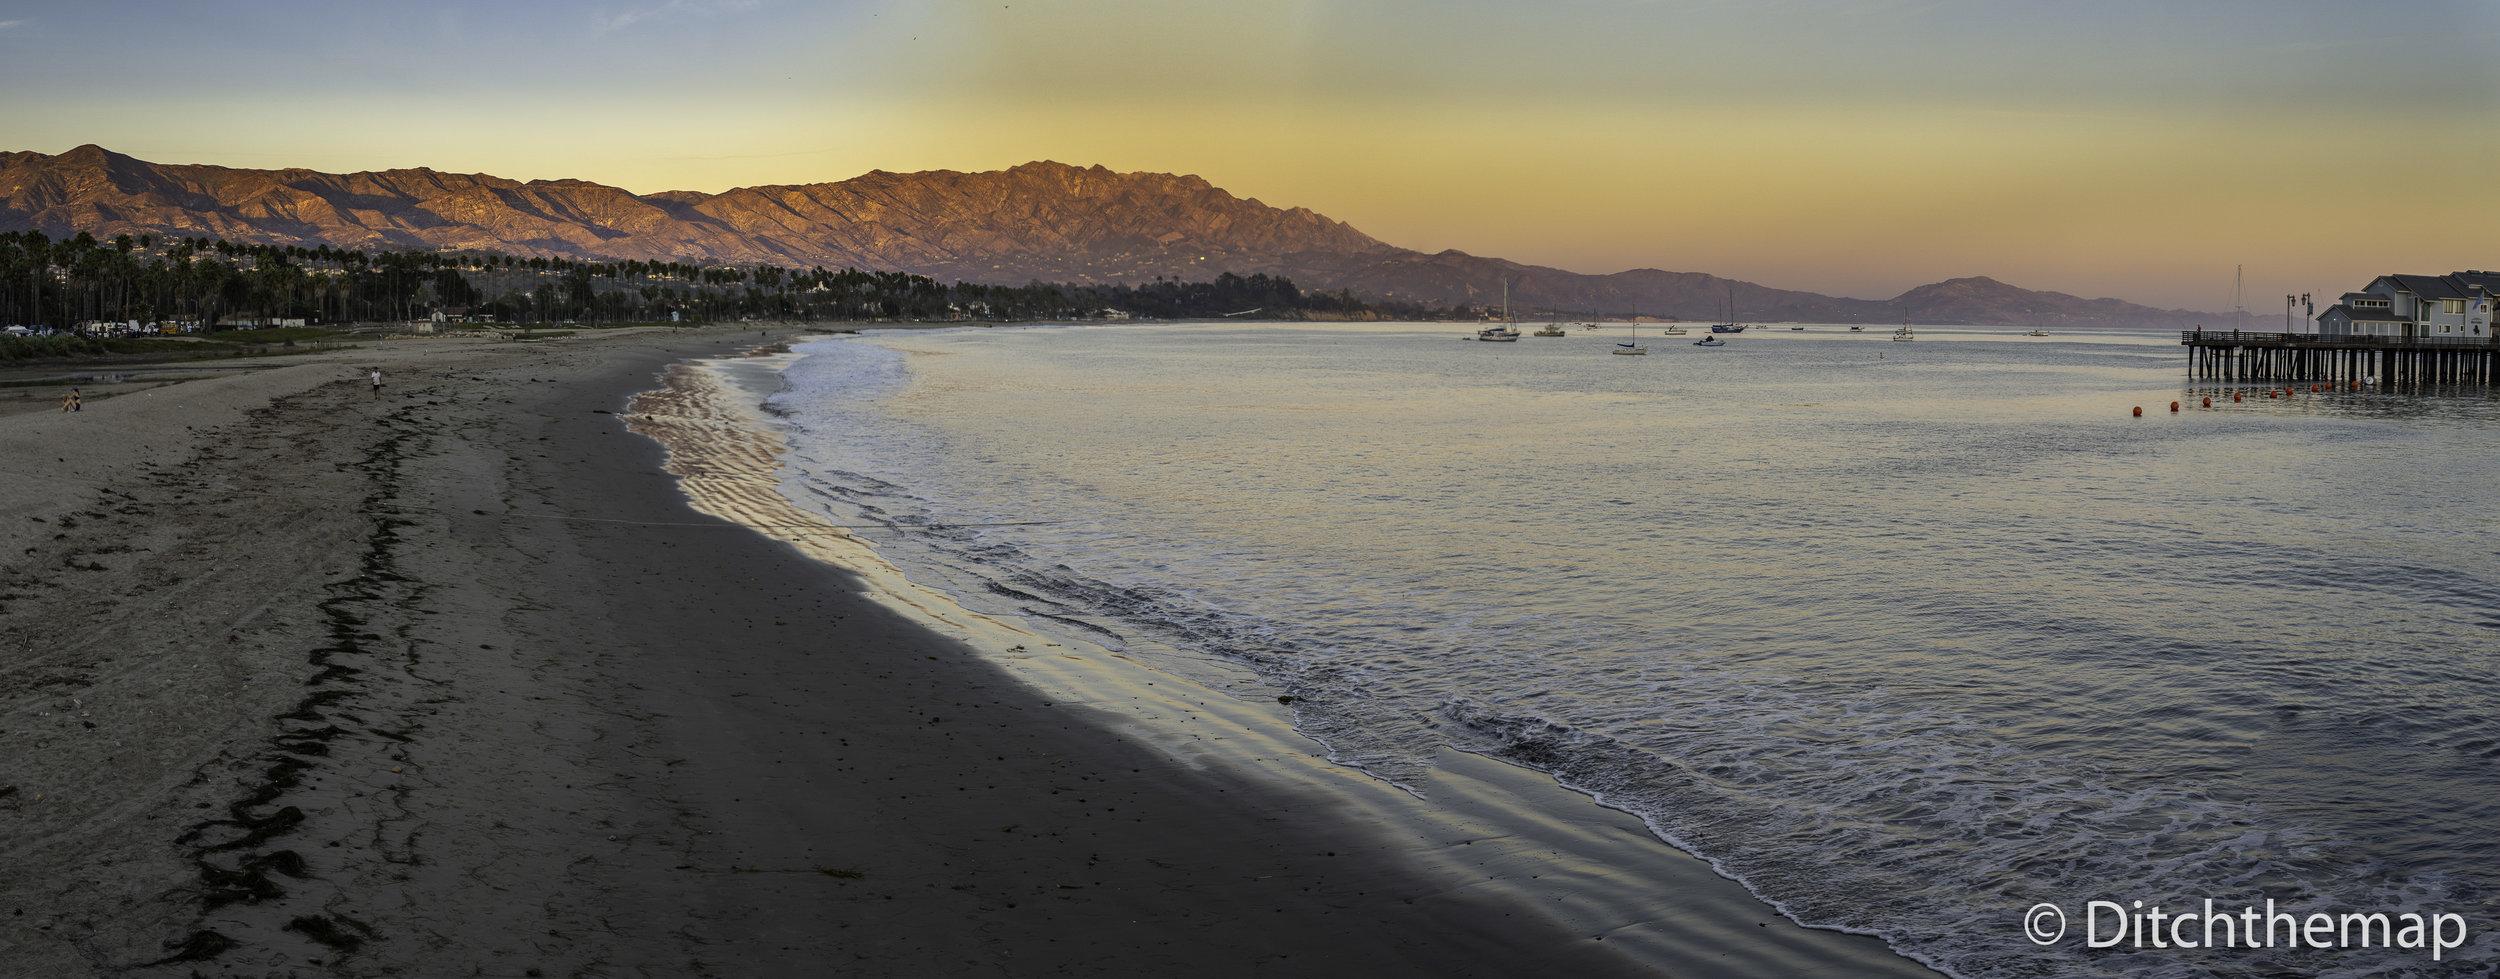 Sunset in Santa Barbara, California